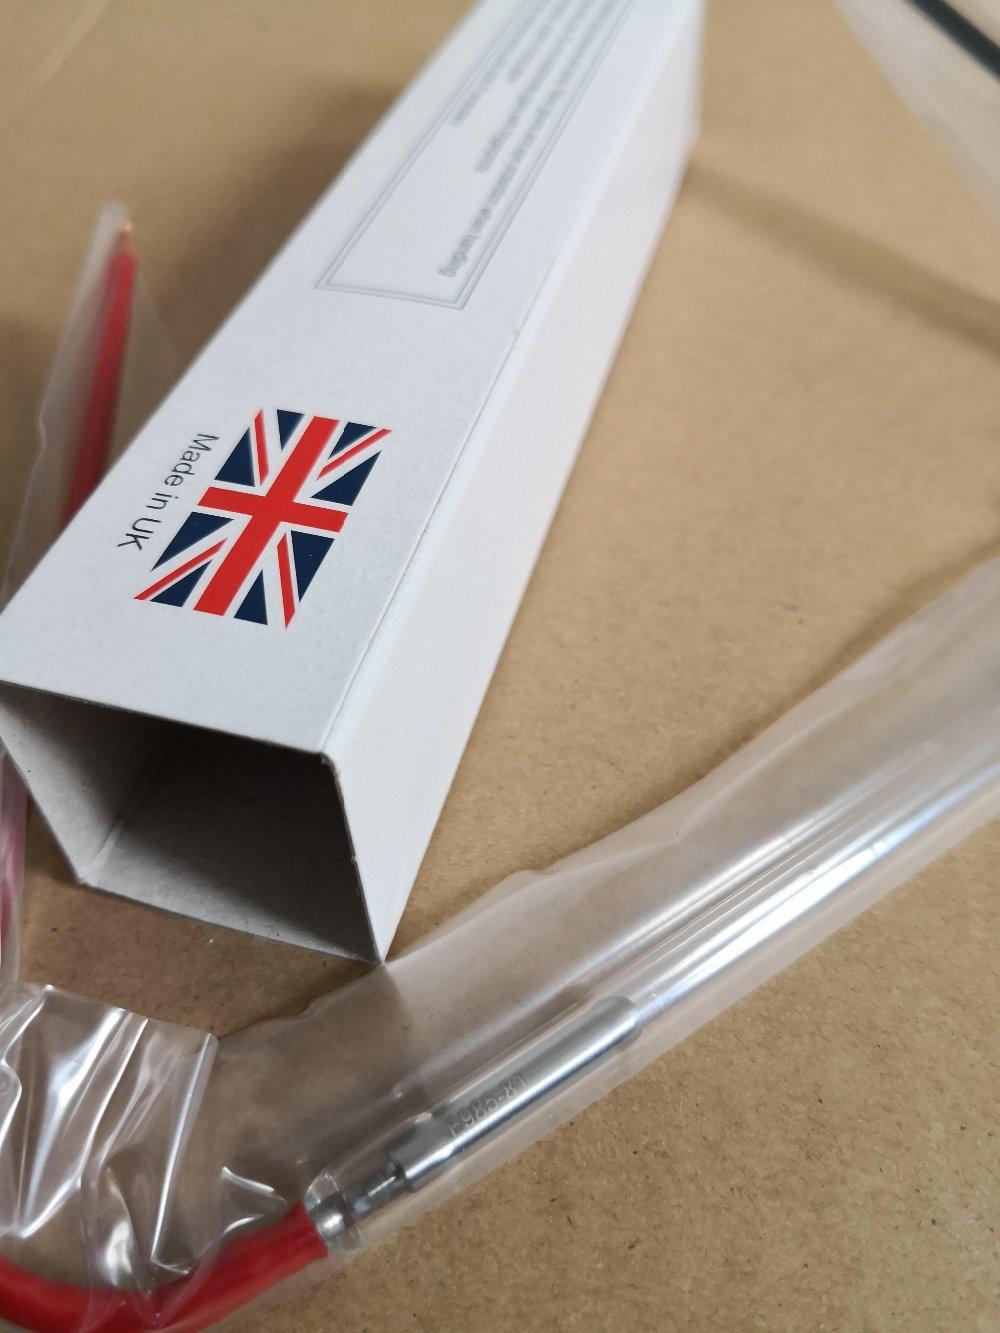 7*60*125mm UK Xenon Lamp IPL Xenon Lamp E-light Lamp For Beauty Device Part